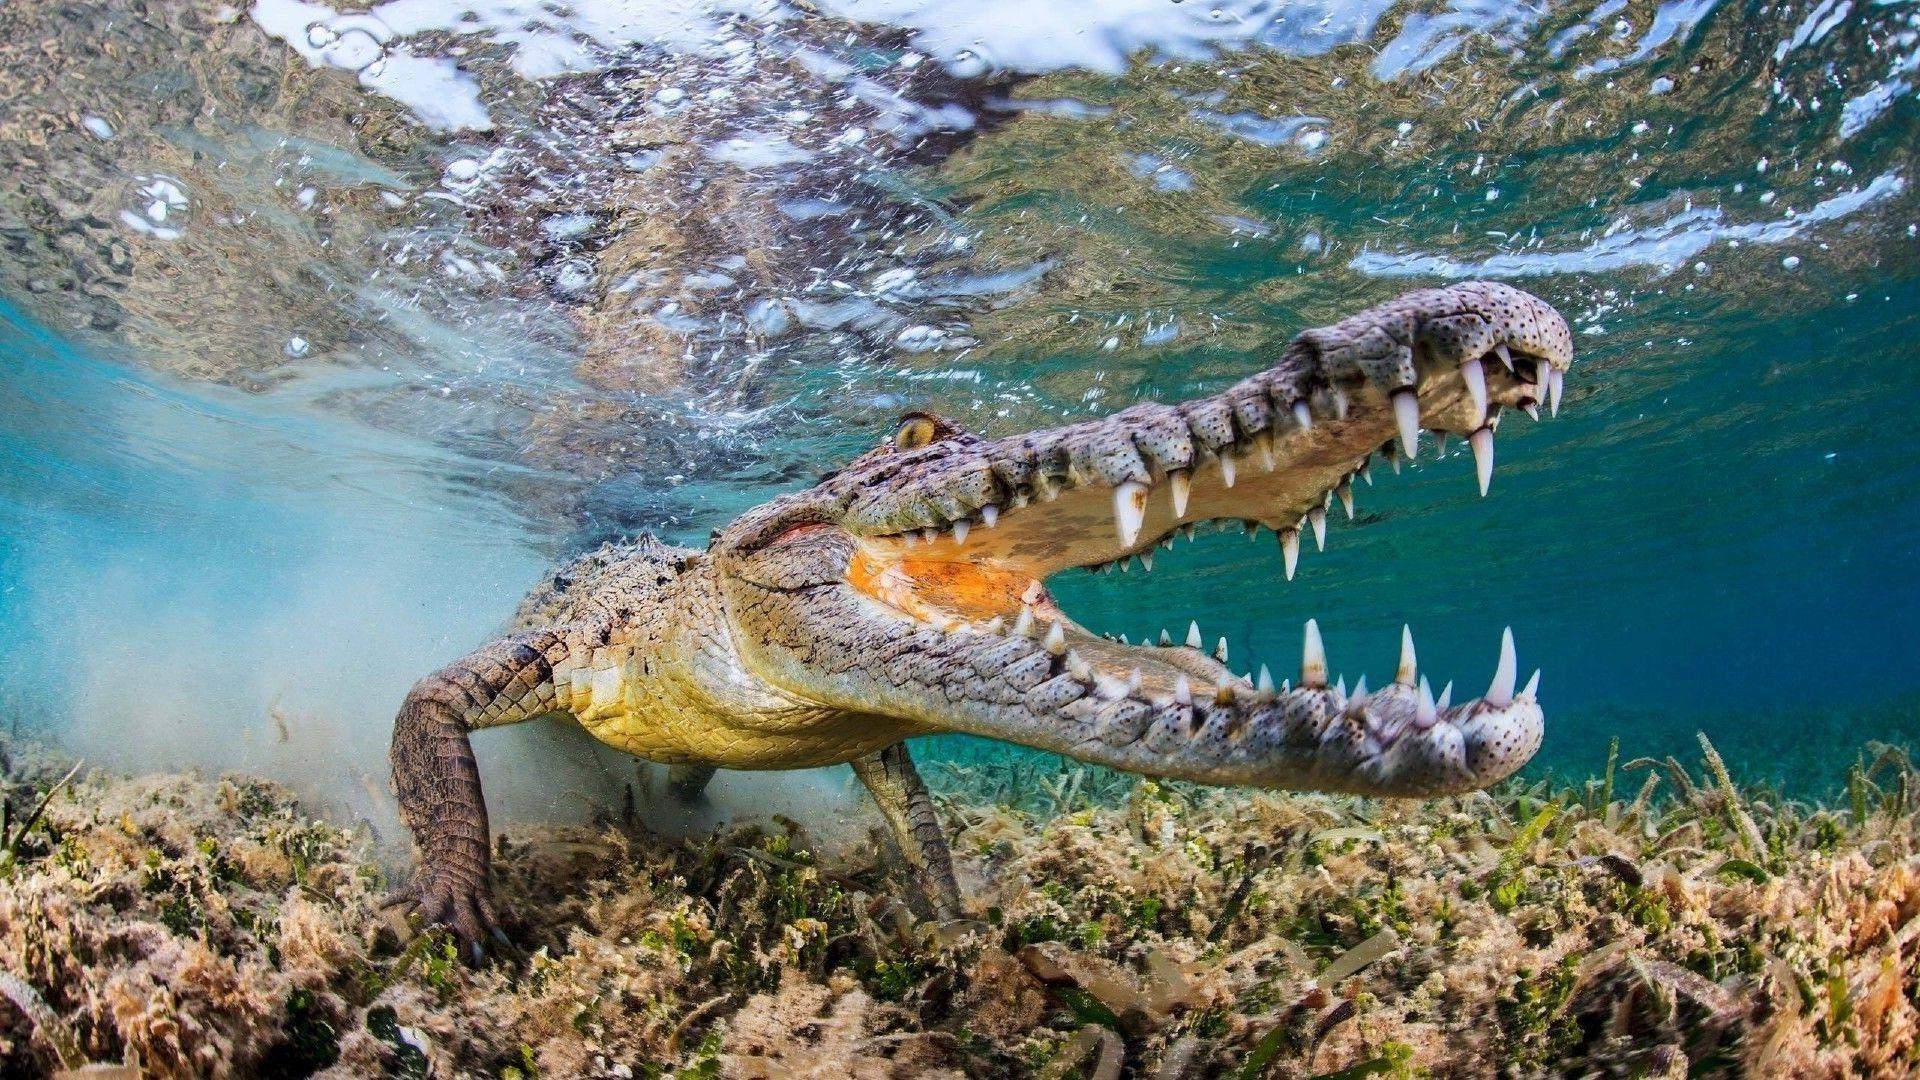 Crocodile Under Water Photos